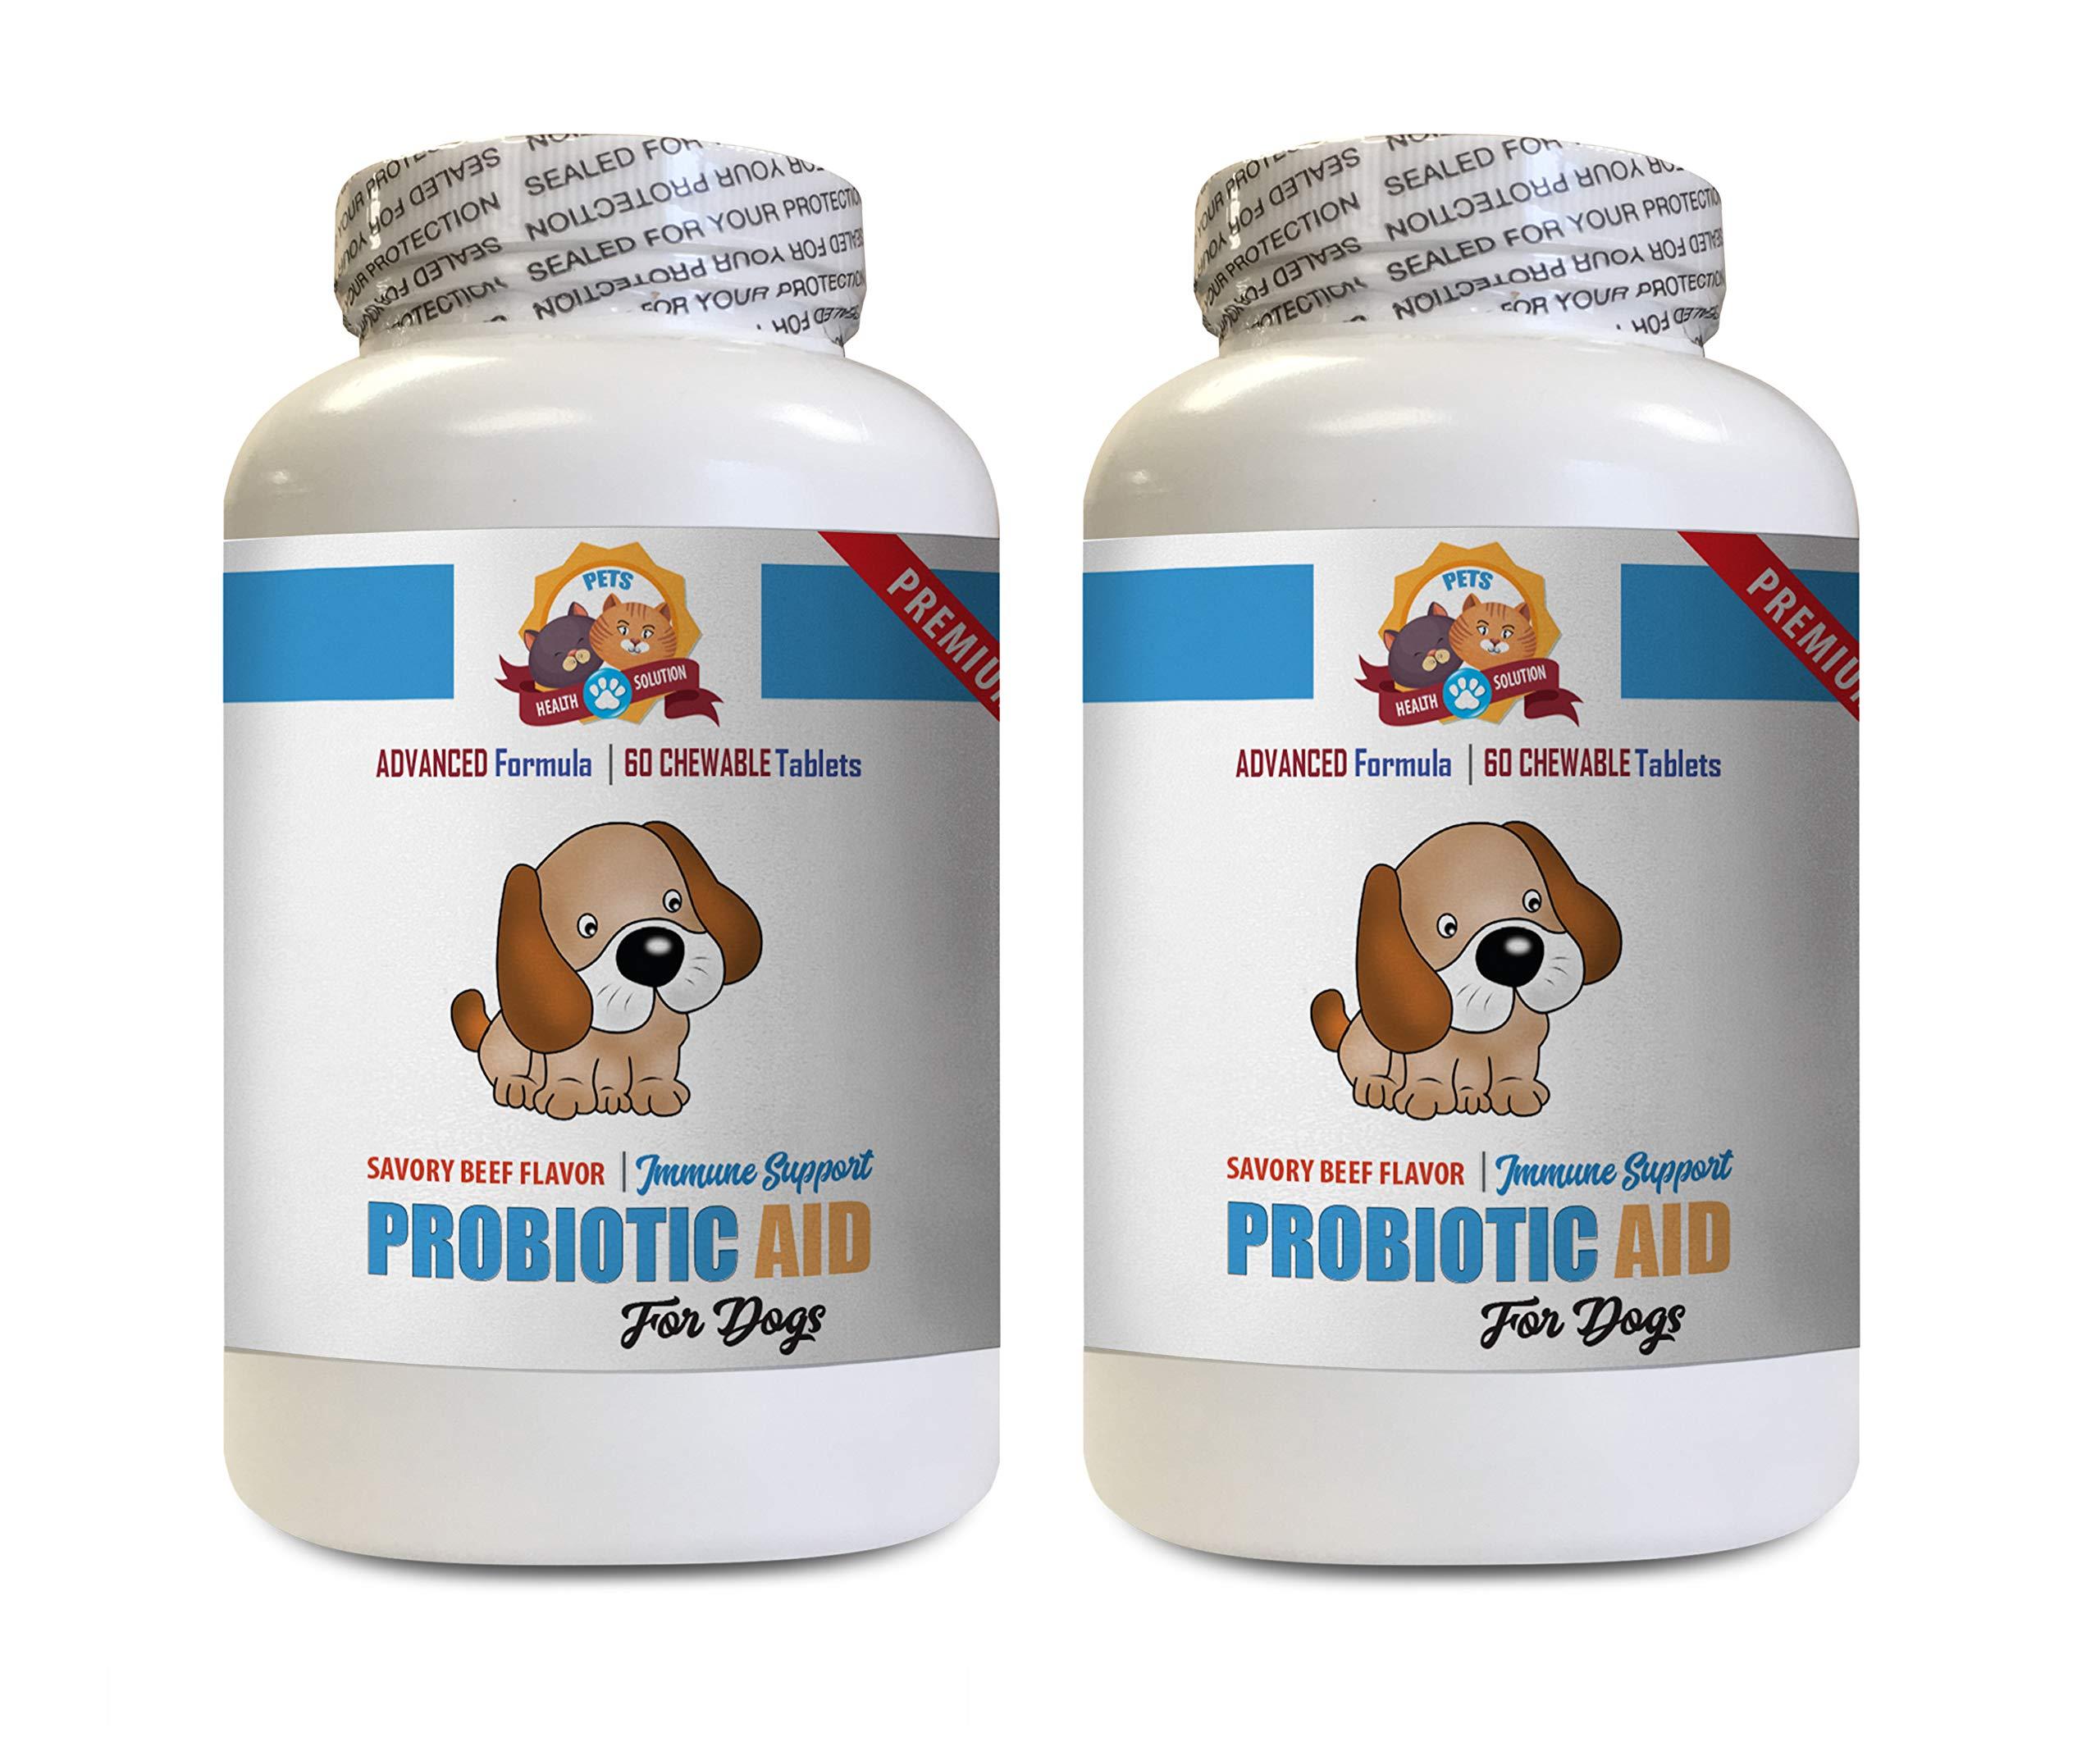 PETS HEALTH SOLUTION Dog probiotic Bites - Dog PROBIOTIC AID - Digestive Boost - GET RID of Bad Breath - Solves Bad Gas Issues - Dog Digestive Bowls - 2 Bottles (120 Chewable Tablets) by PETS HEALTH SOLUTION